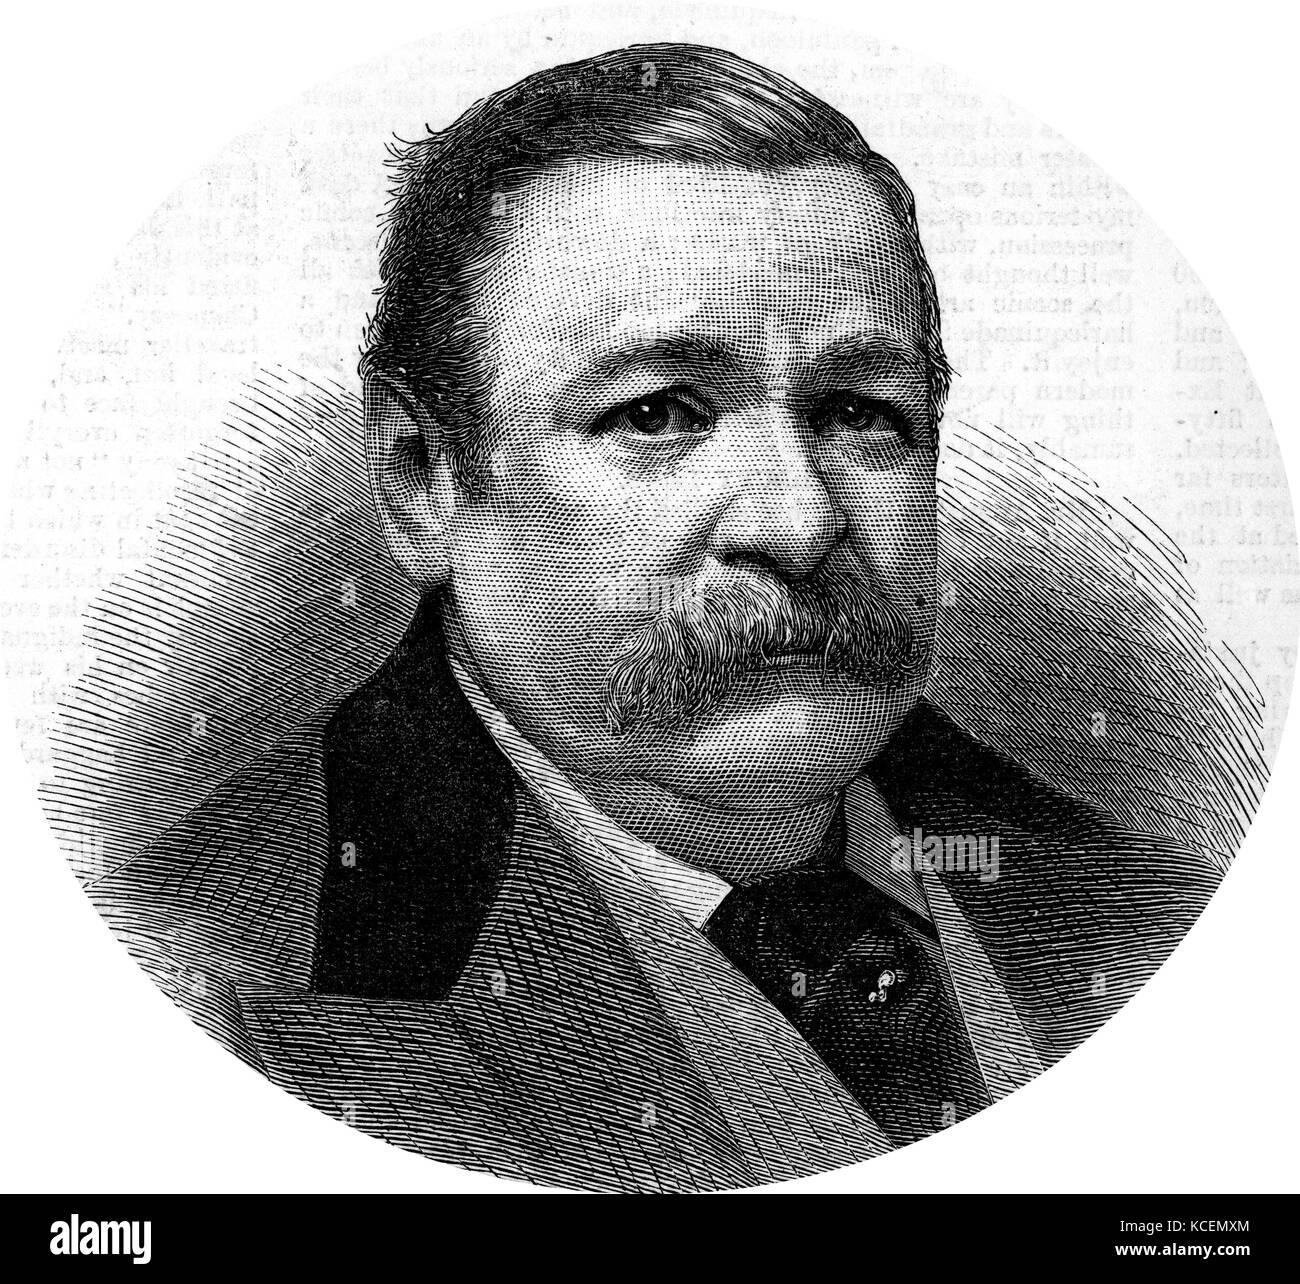 George Augustus Henry Sala (24 November 1828 – 8 December 1895), was an English journalist. - Stock Image